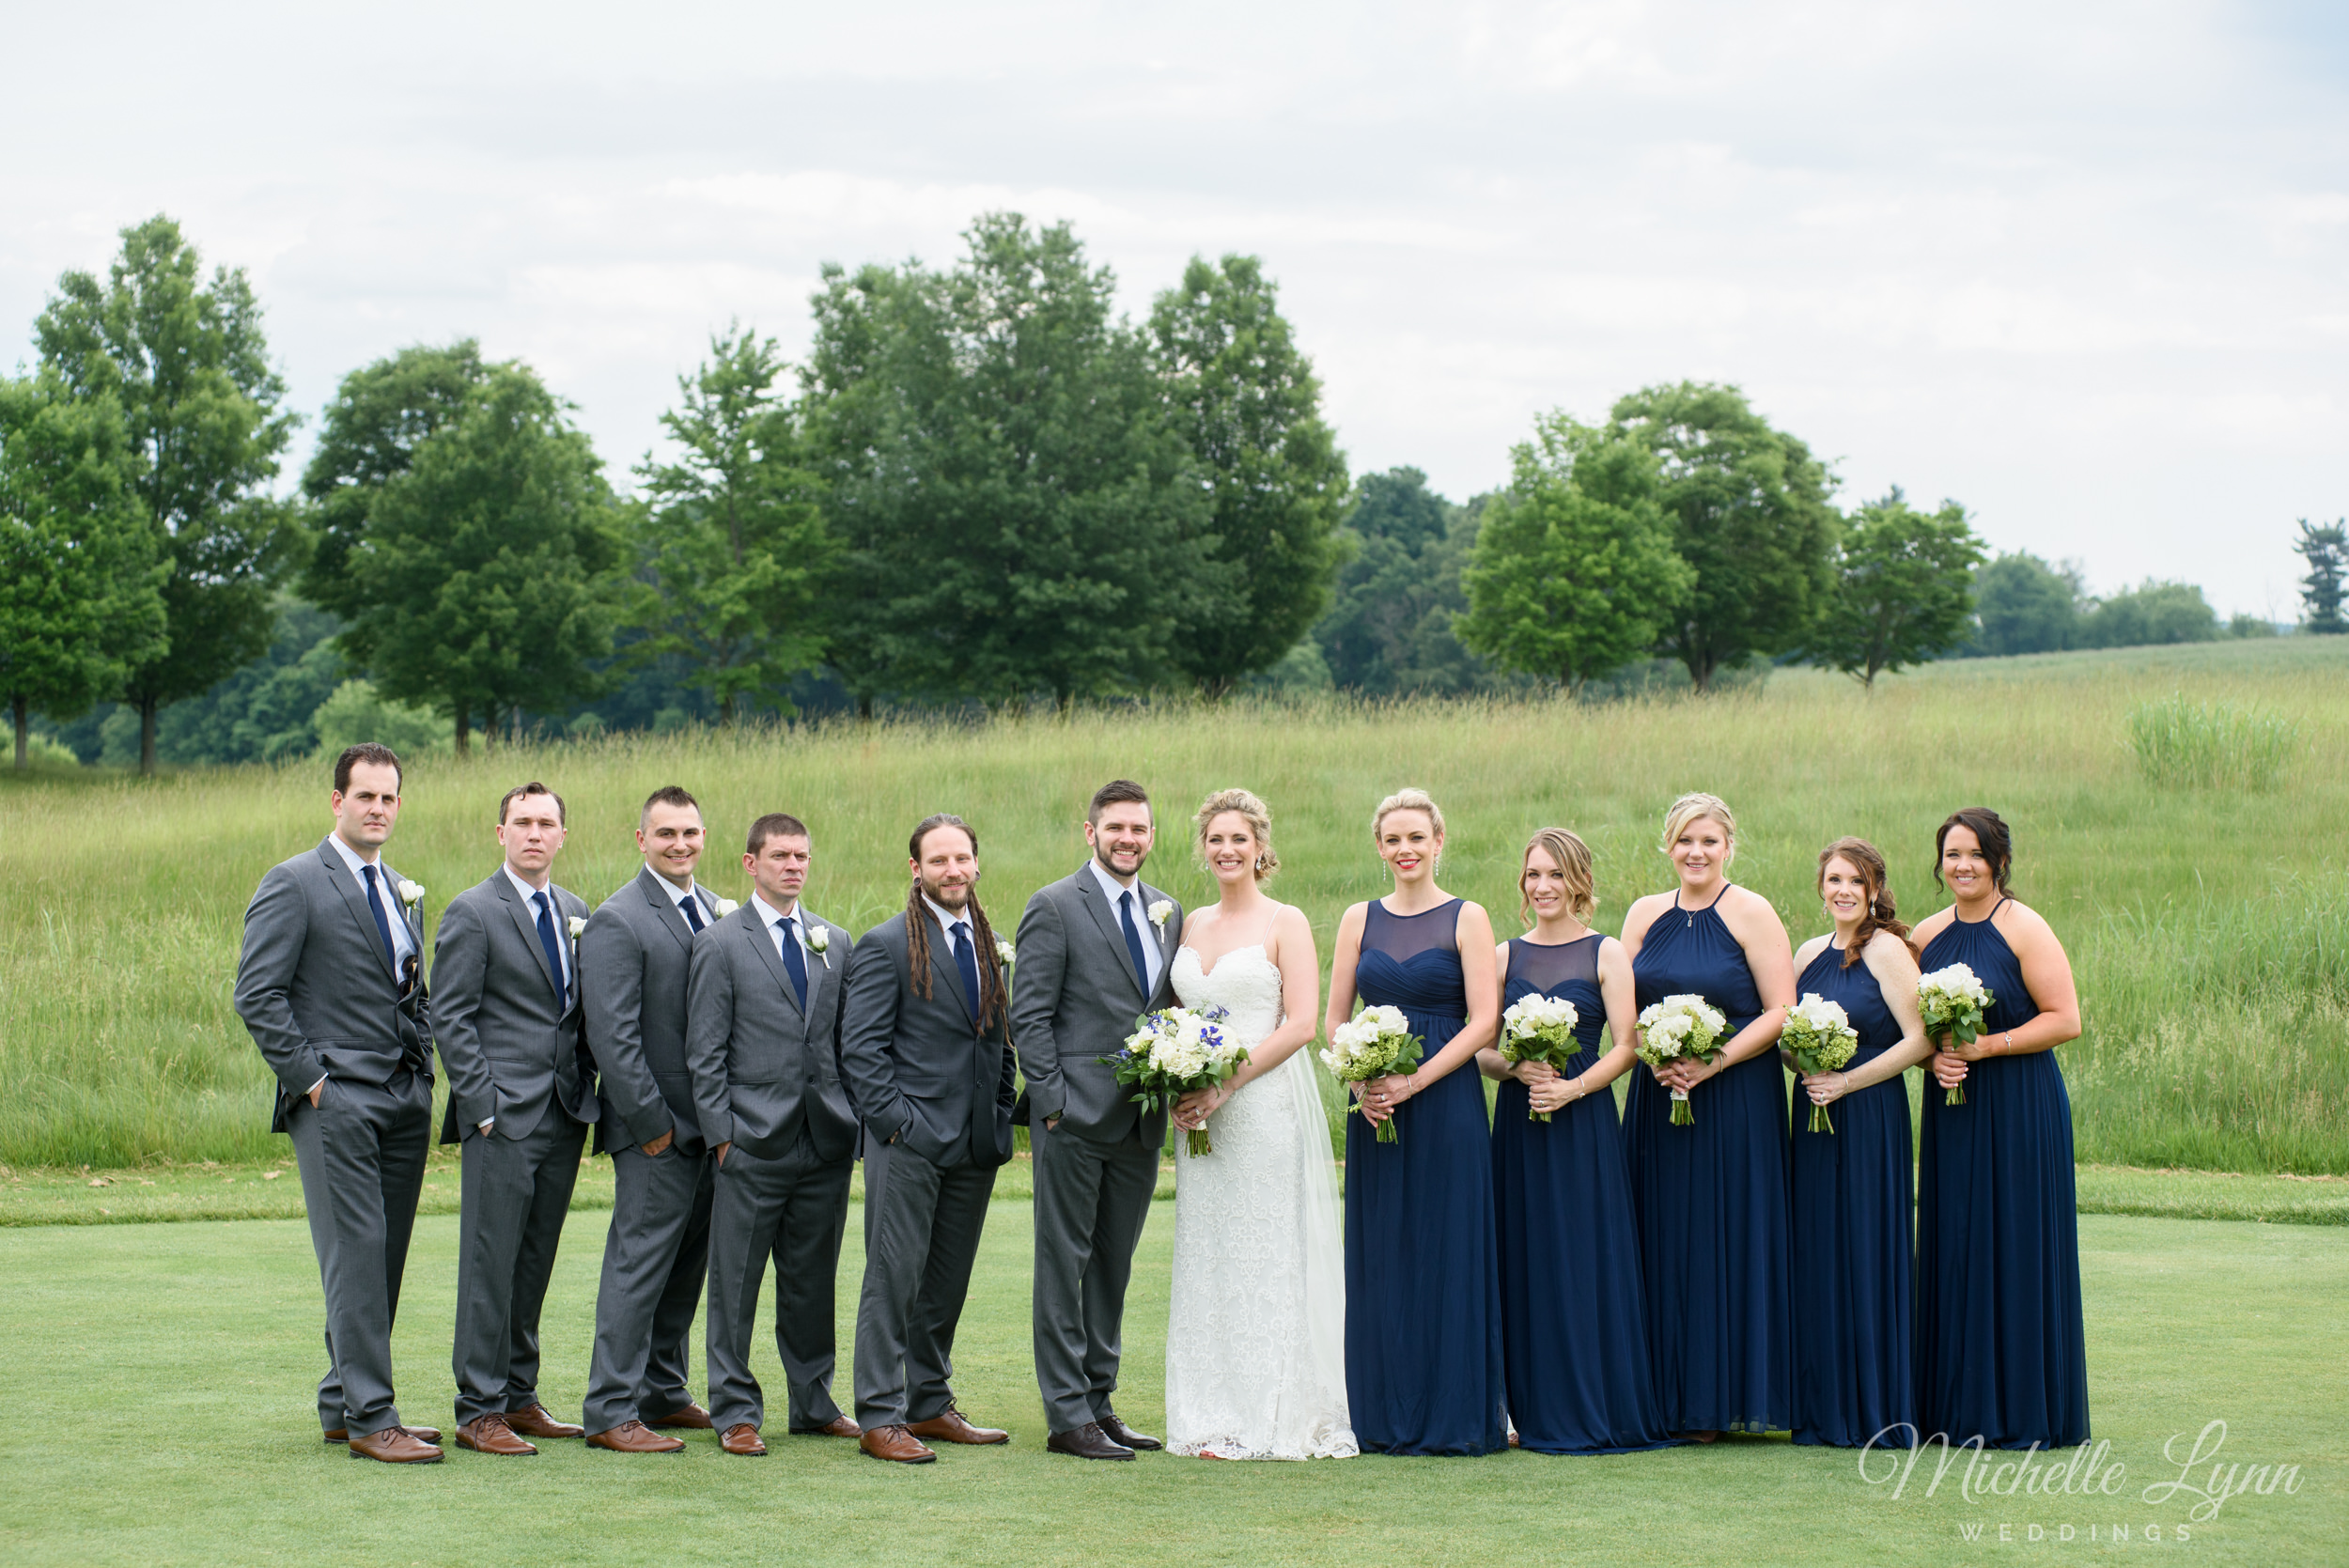 mlw-jericho-national-golf-club-wedding-photography-50.jpg